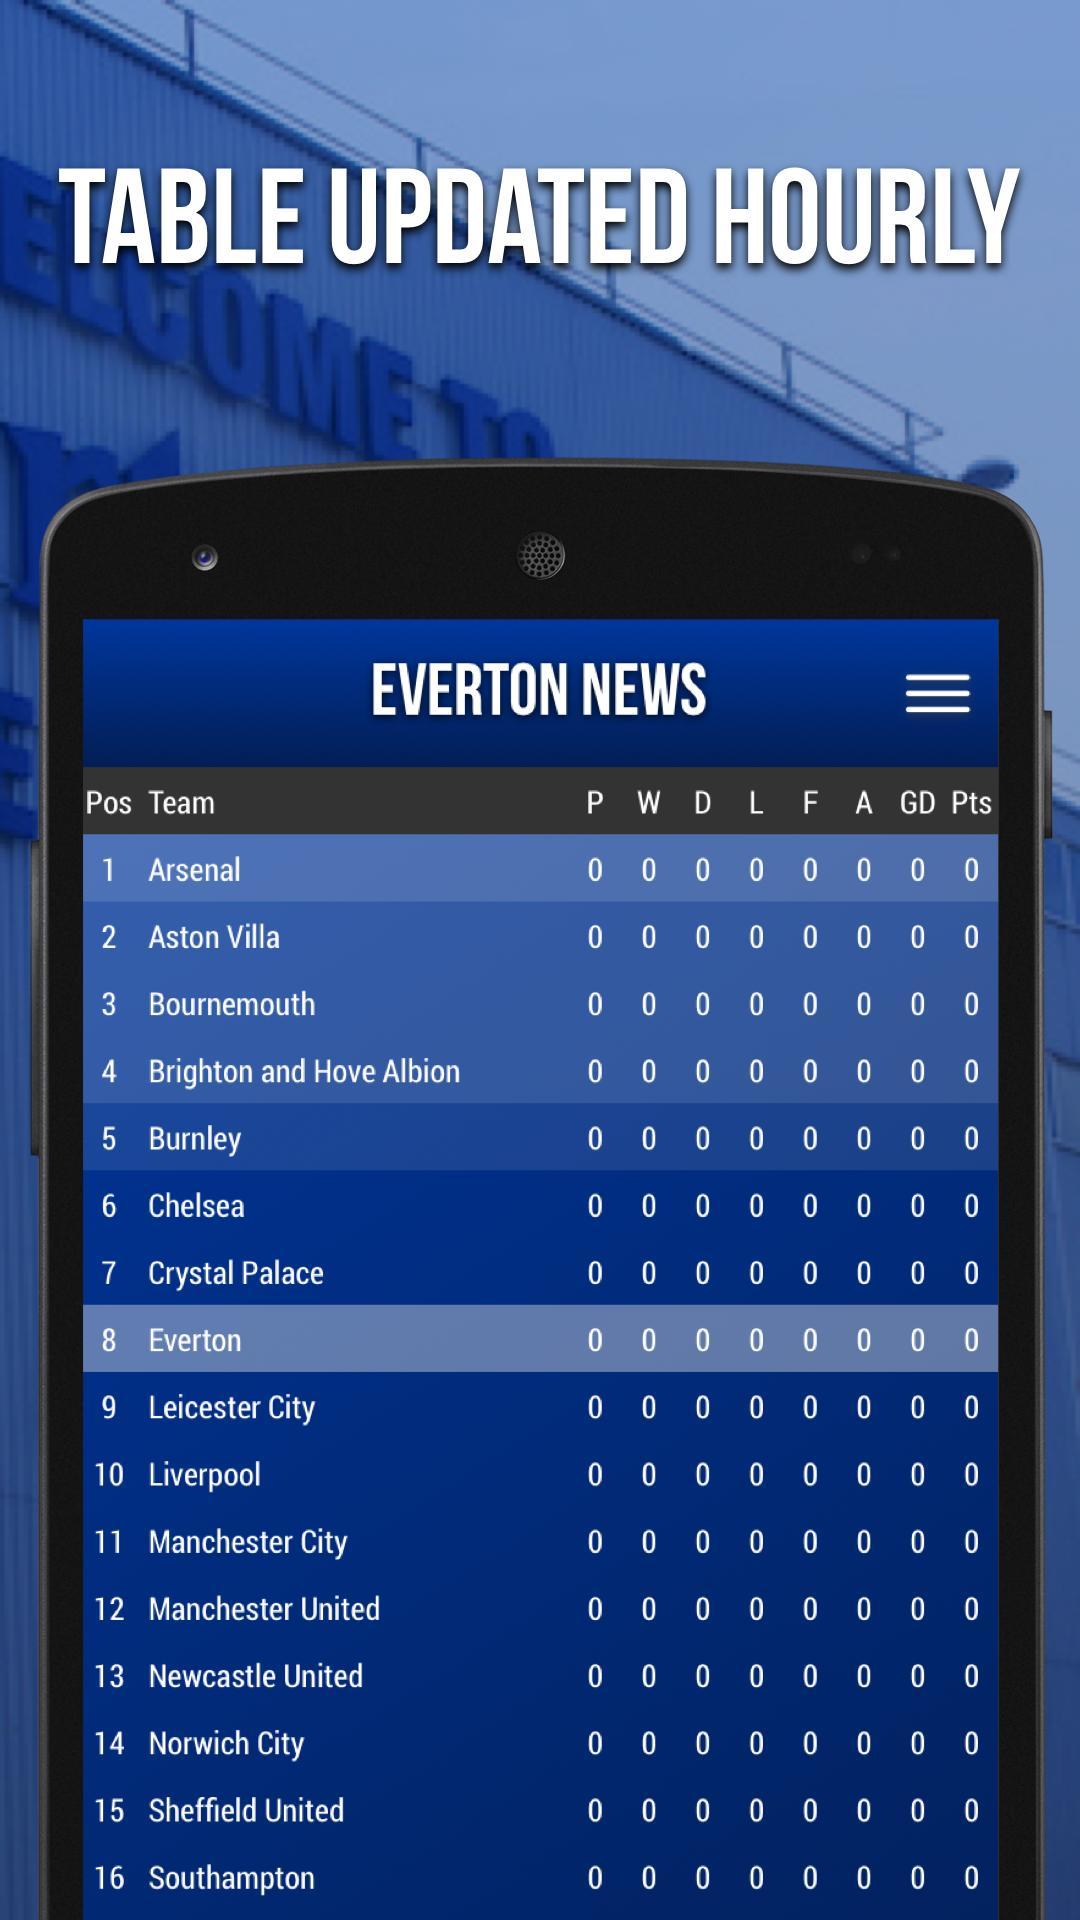 Evertonnews